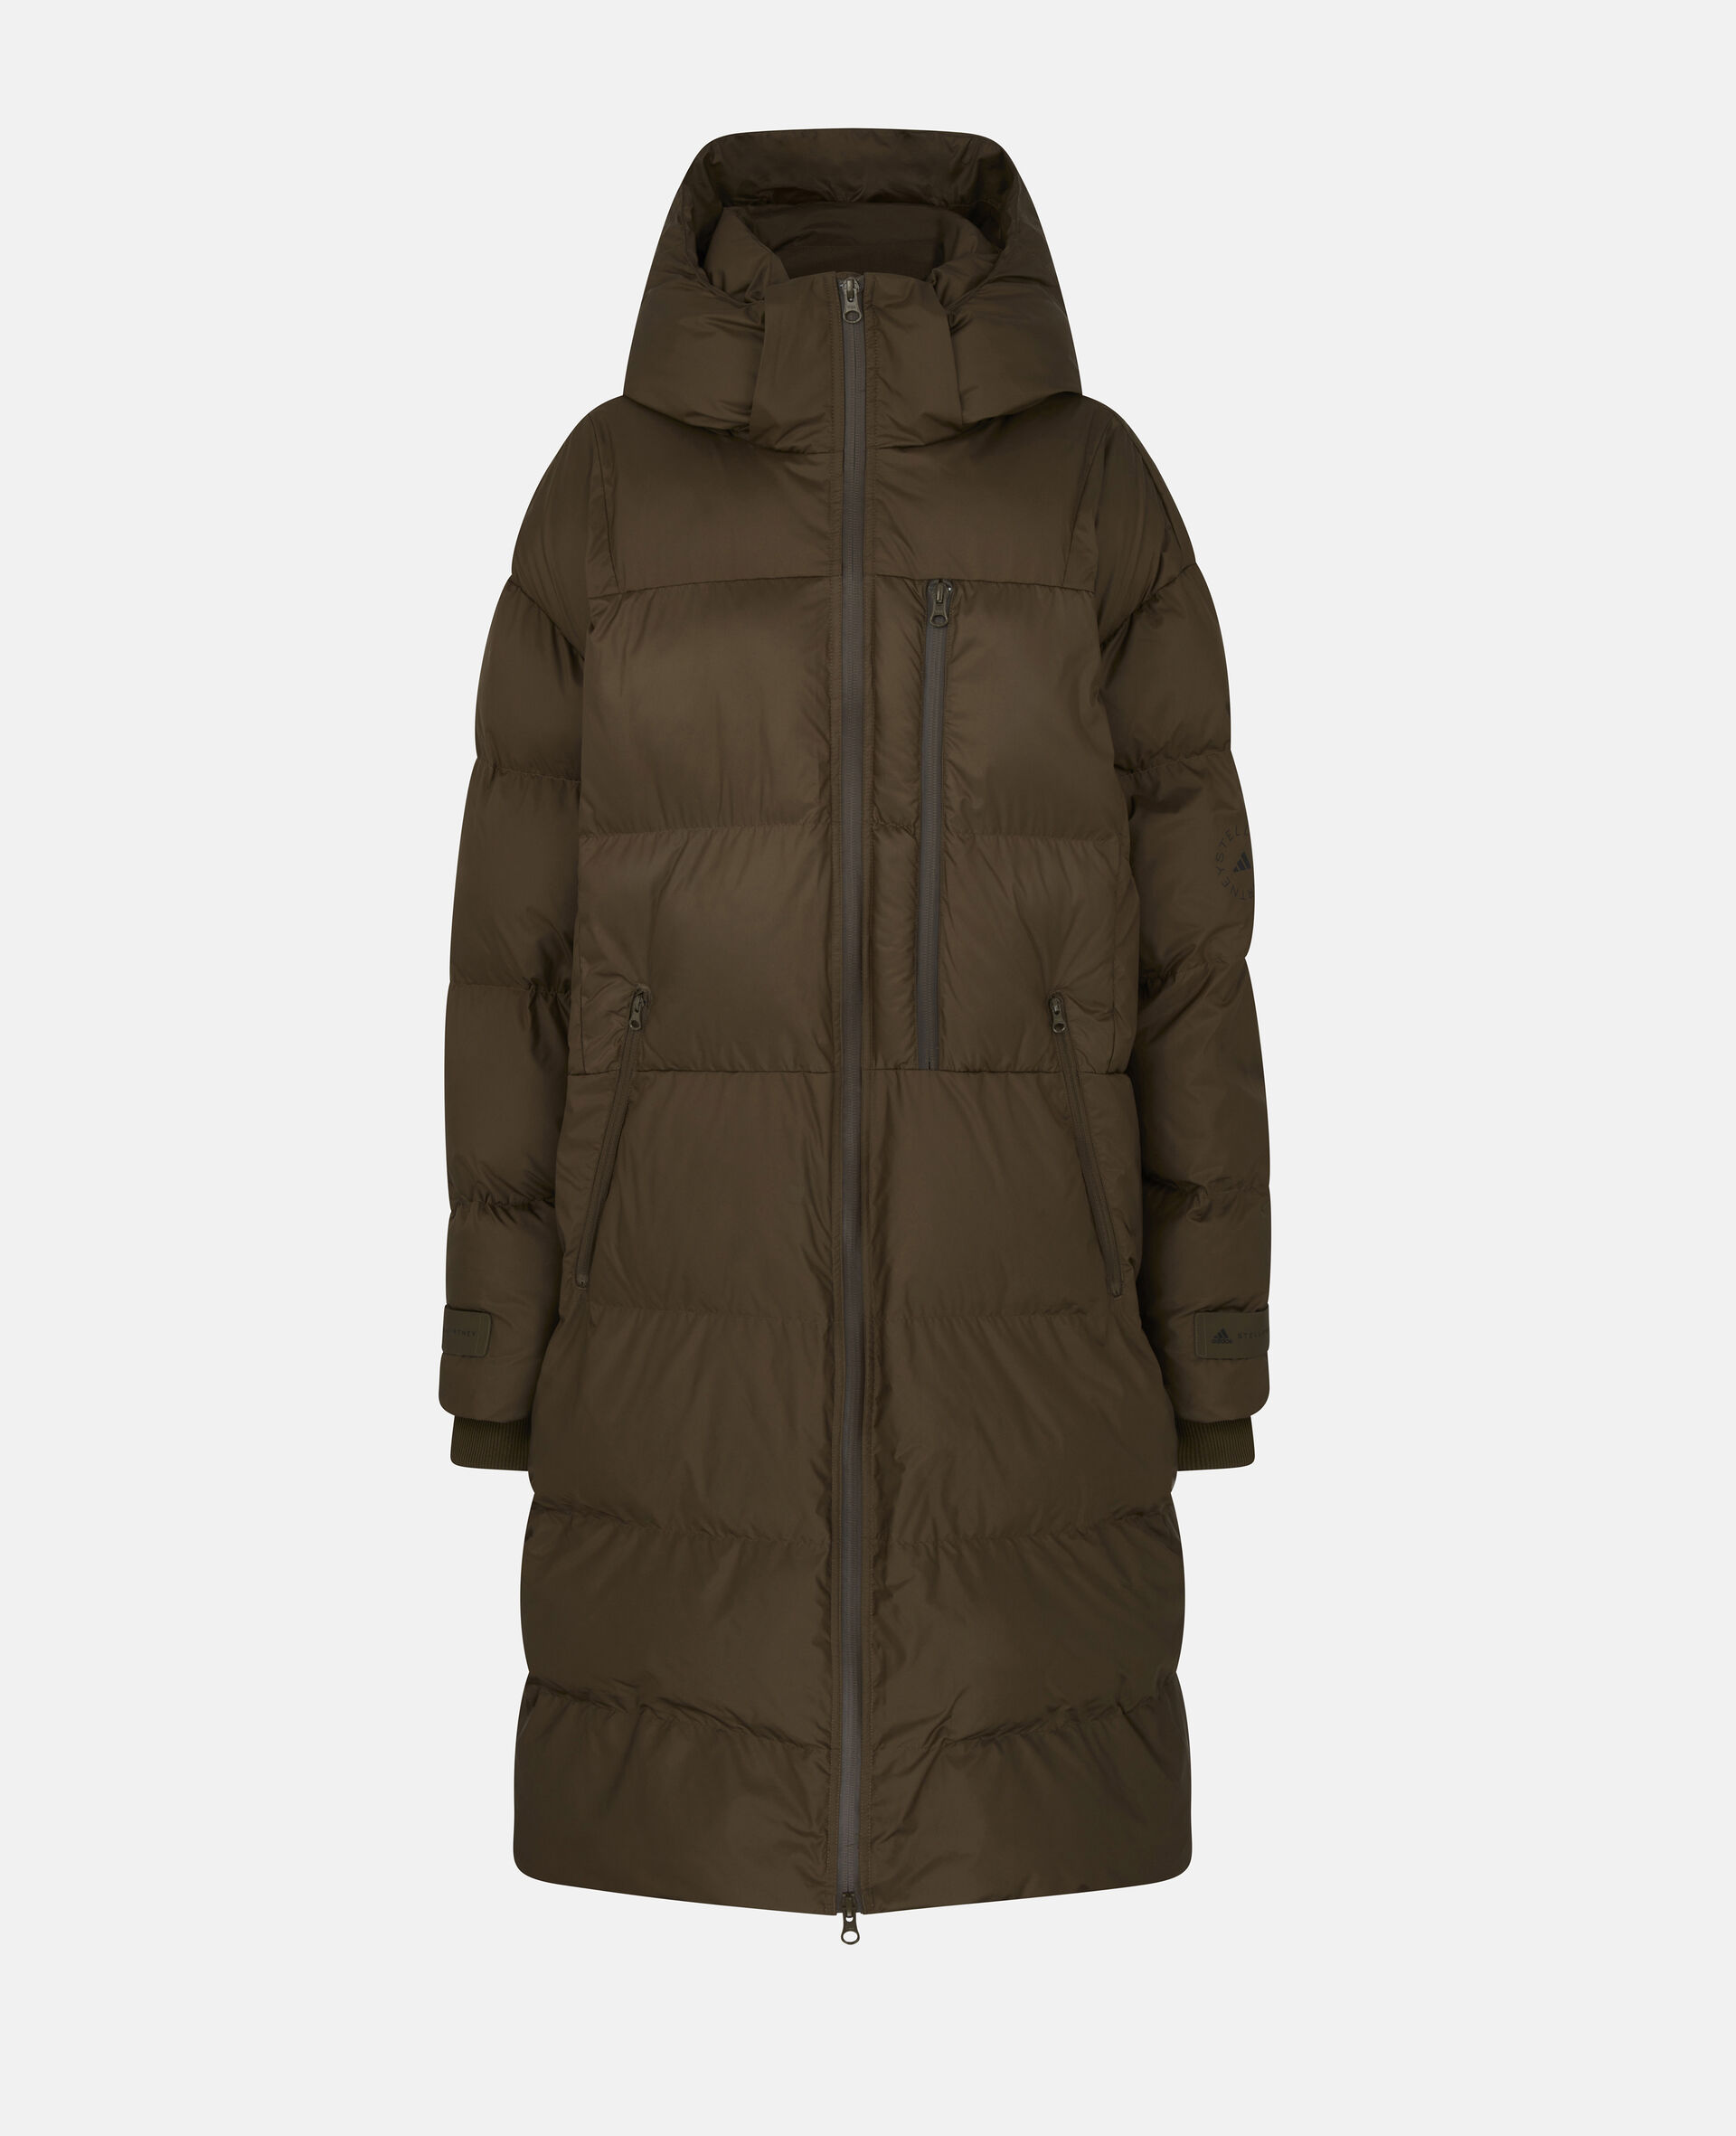 Long Training Puffer Jacket-Brown-large image number 0